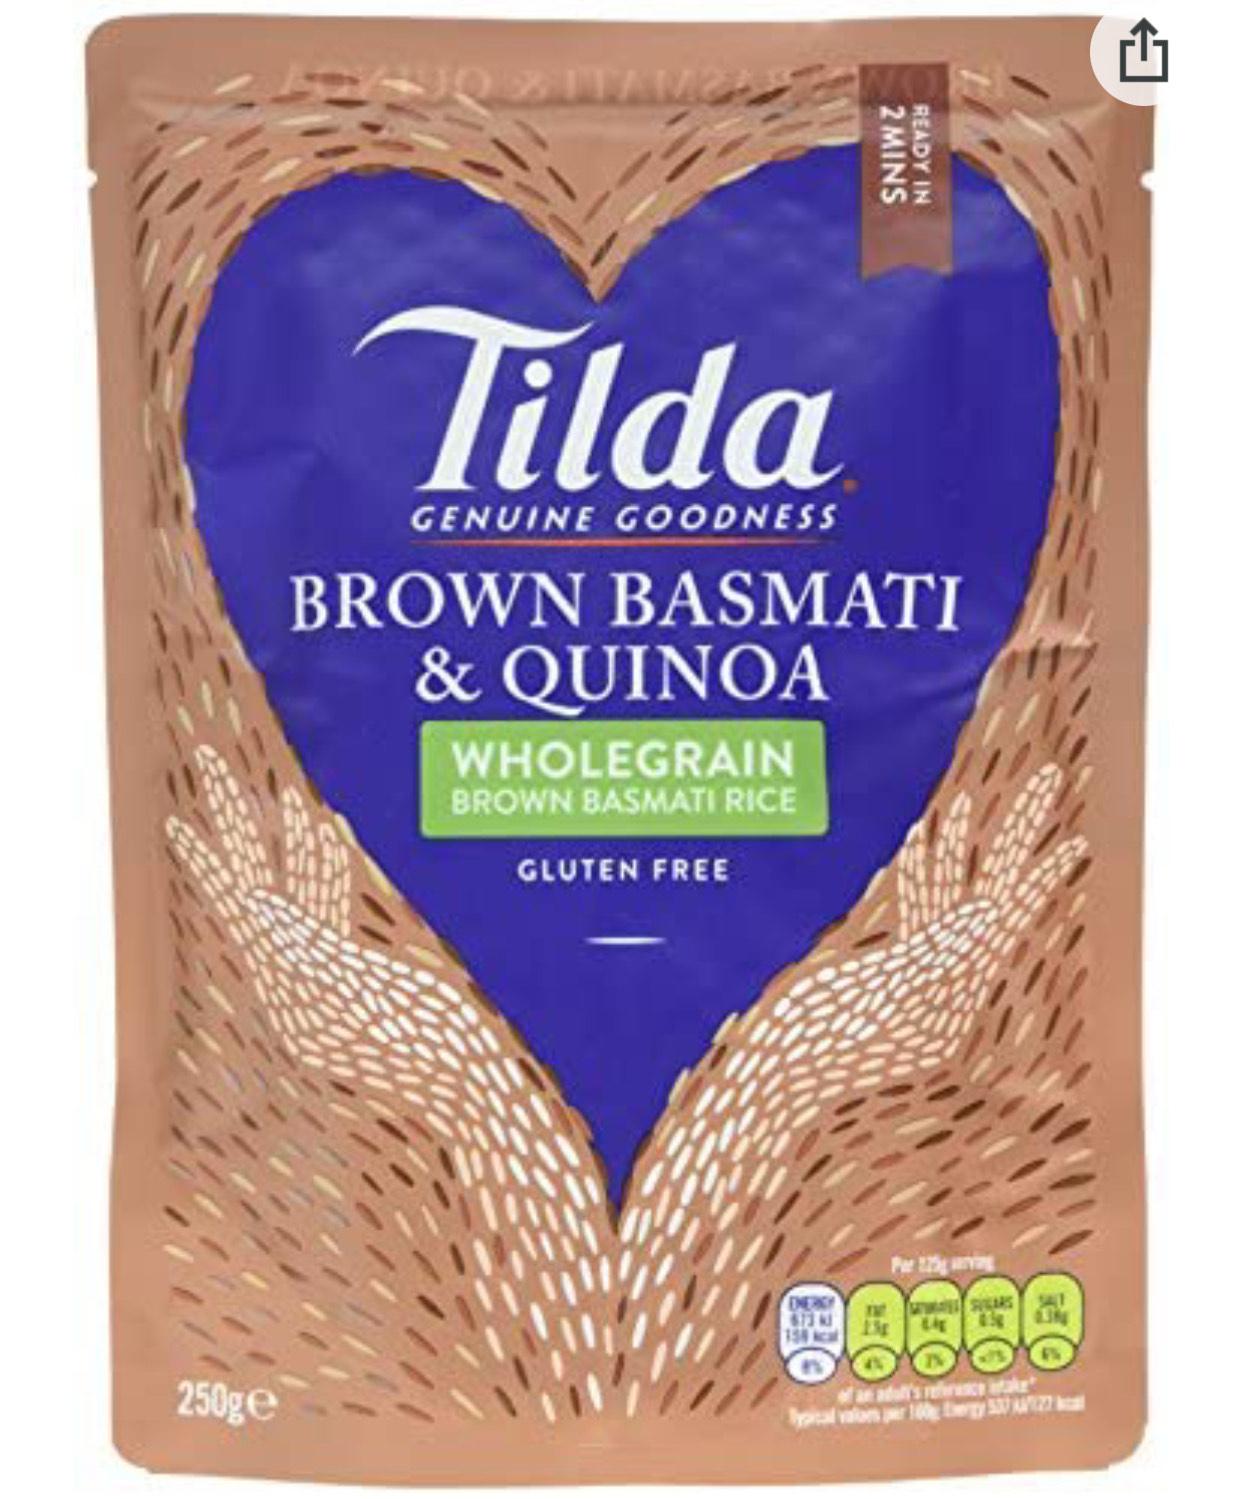 Tilda Brown Steamed Basmati Rice and Quinoa, 250 g, Pack of 6 - £3.84 / S&S £3.65 (+£4.49 Non Prime) @ Amazon